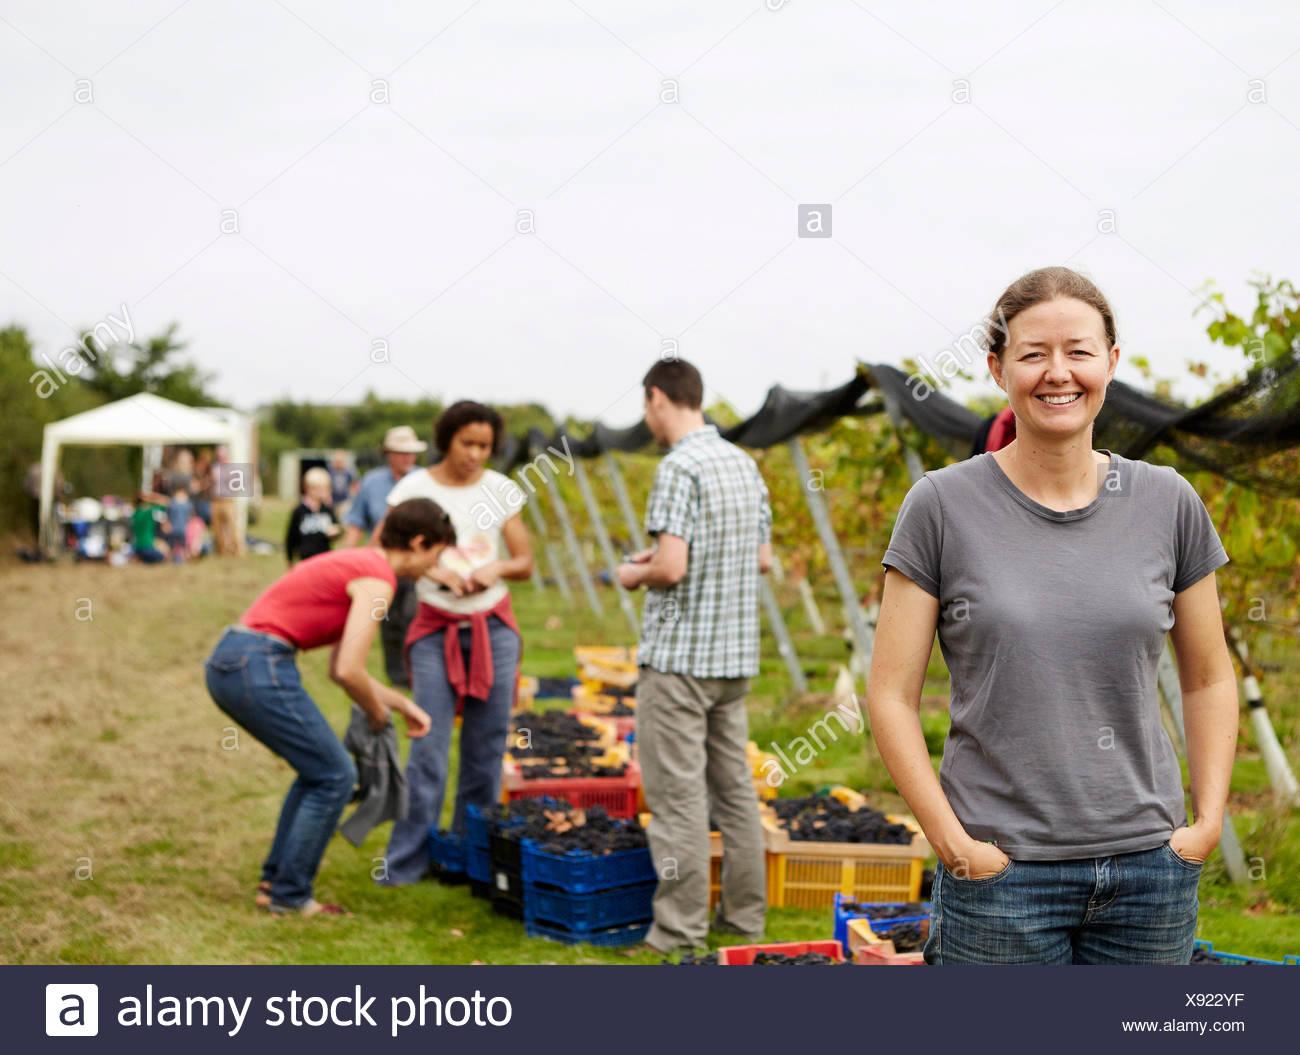 Celebrating Harvest Immagini   Celebrating Harvest Fotos Stock - Alamy 298be0285fea